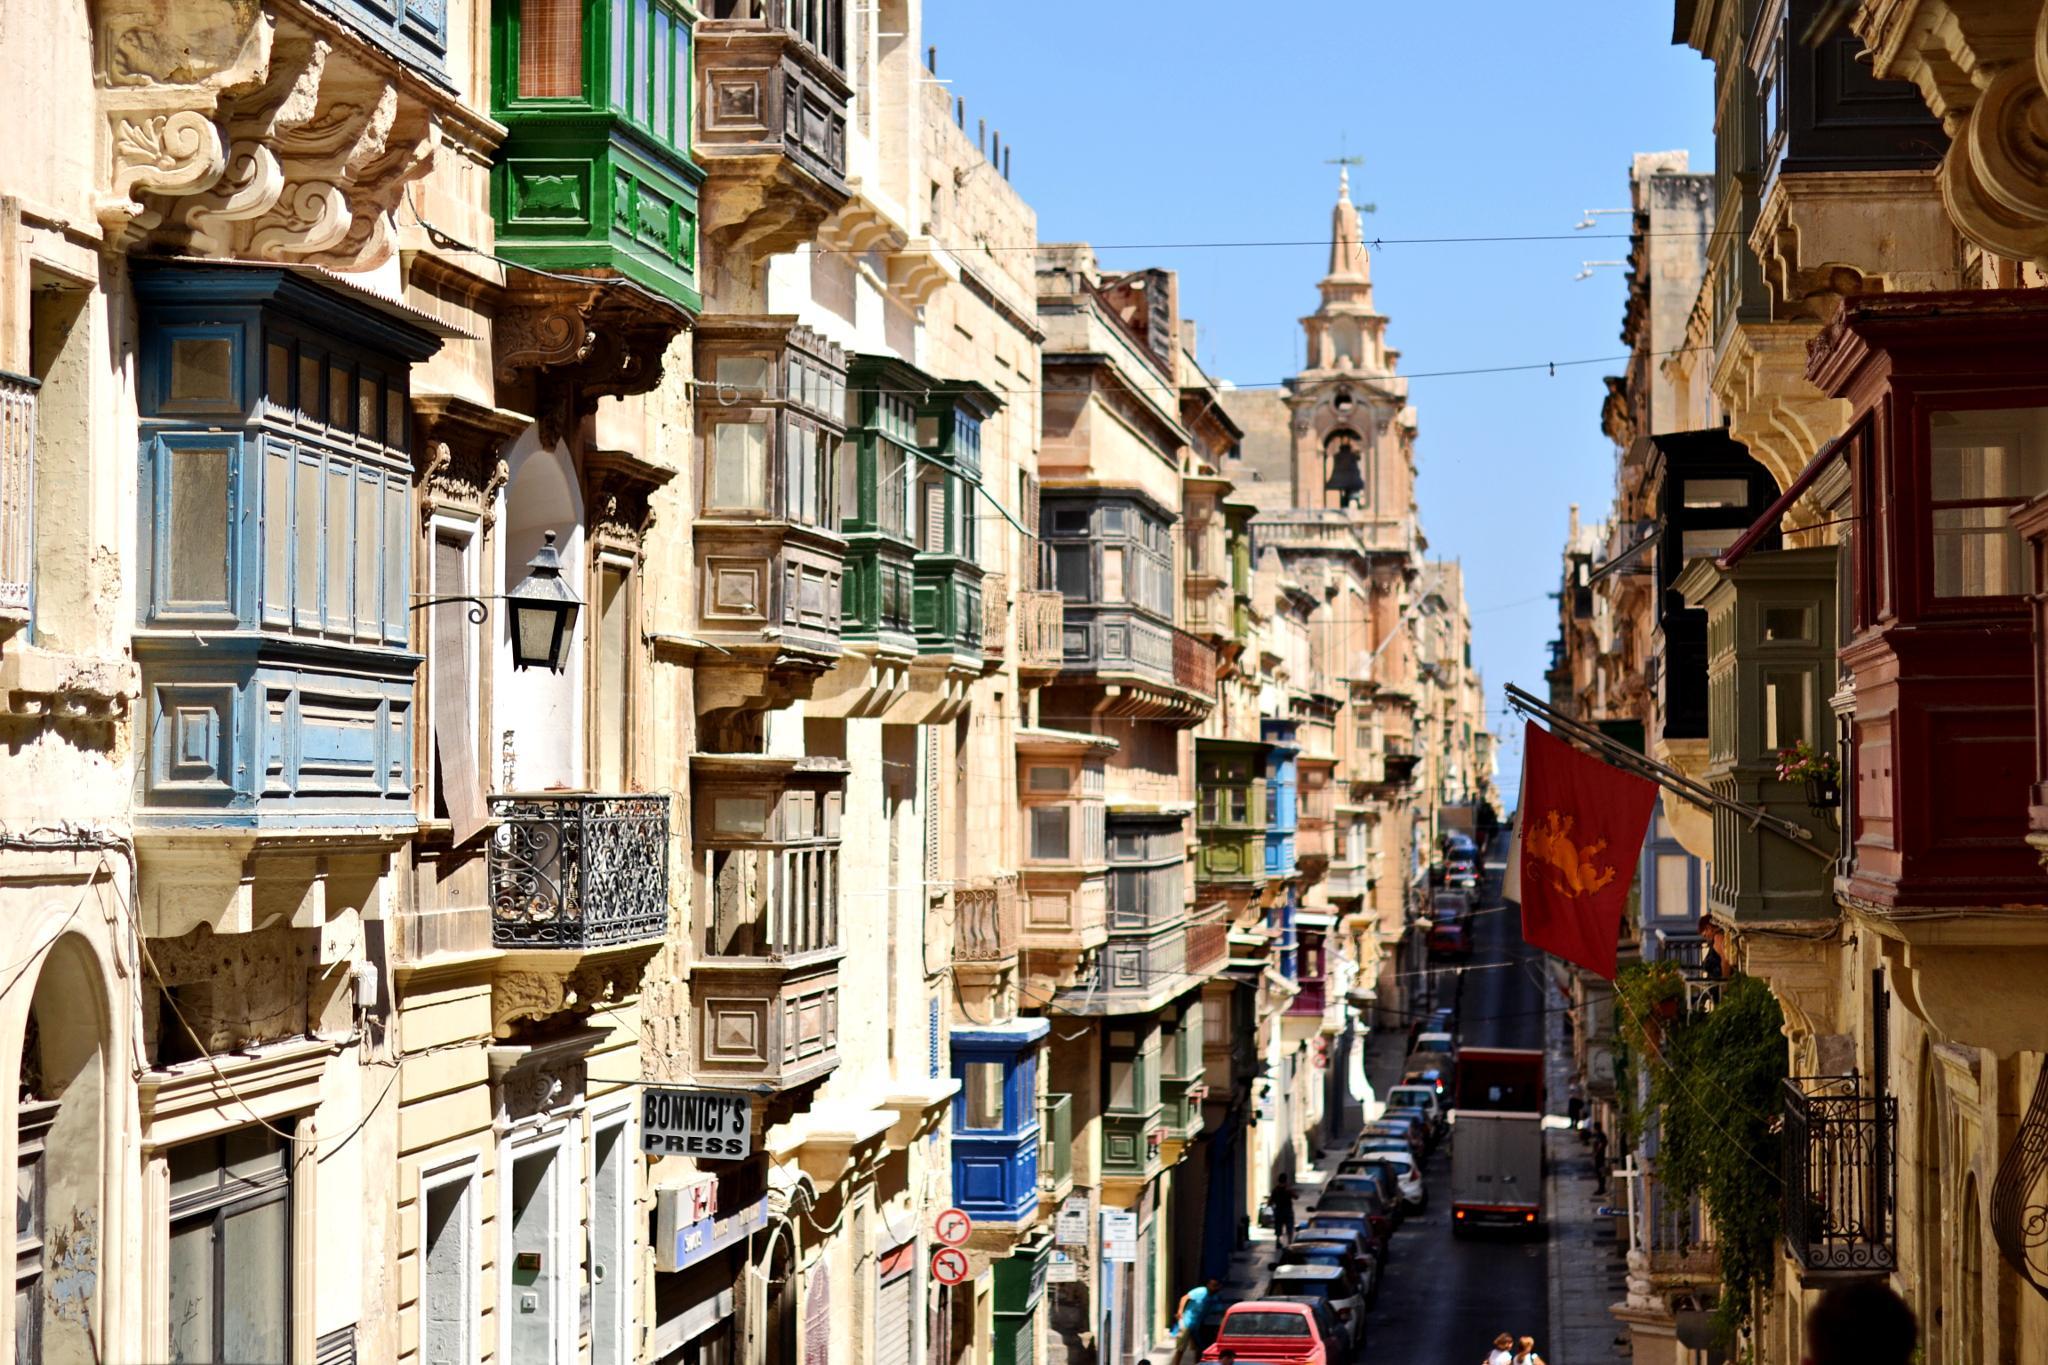 For the Balconies of Malta (1) by Greta Kniežaitė